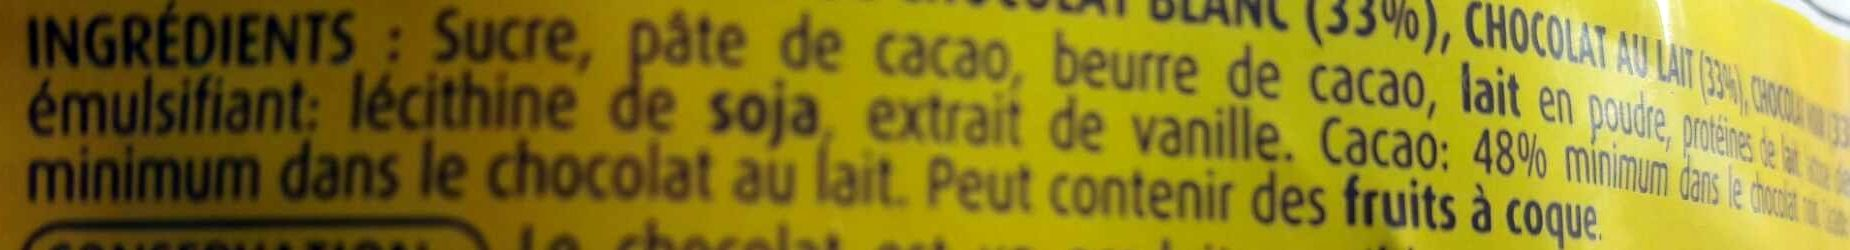 Pépites chunks 3 chocos - Ingredienti - fr